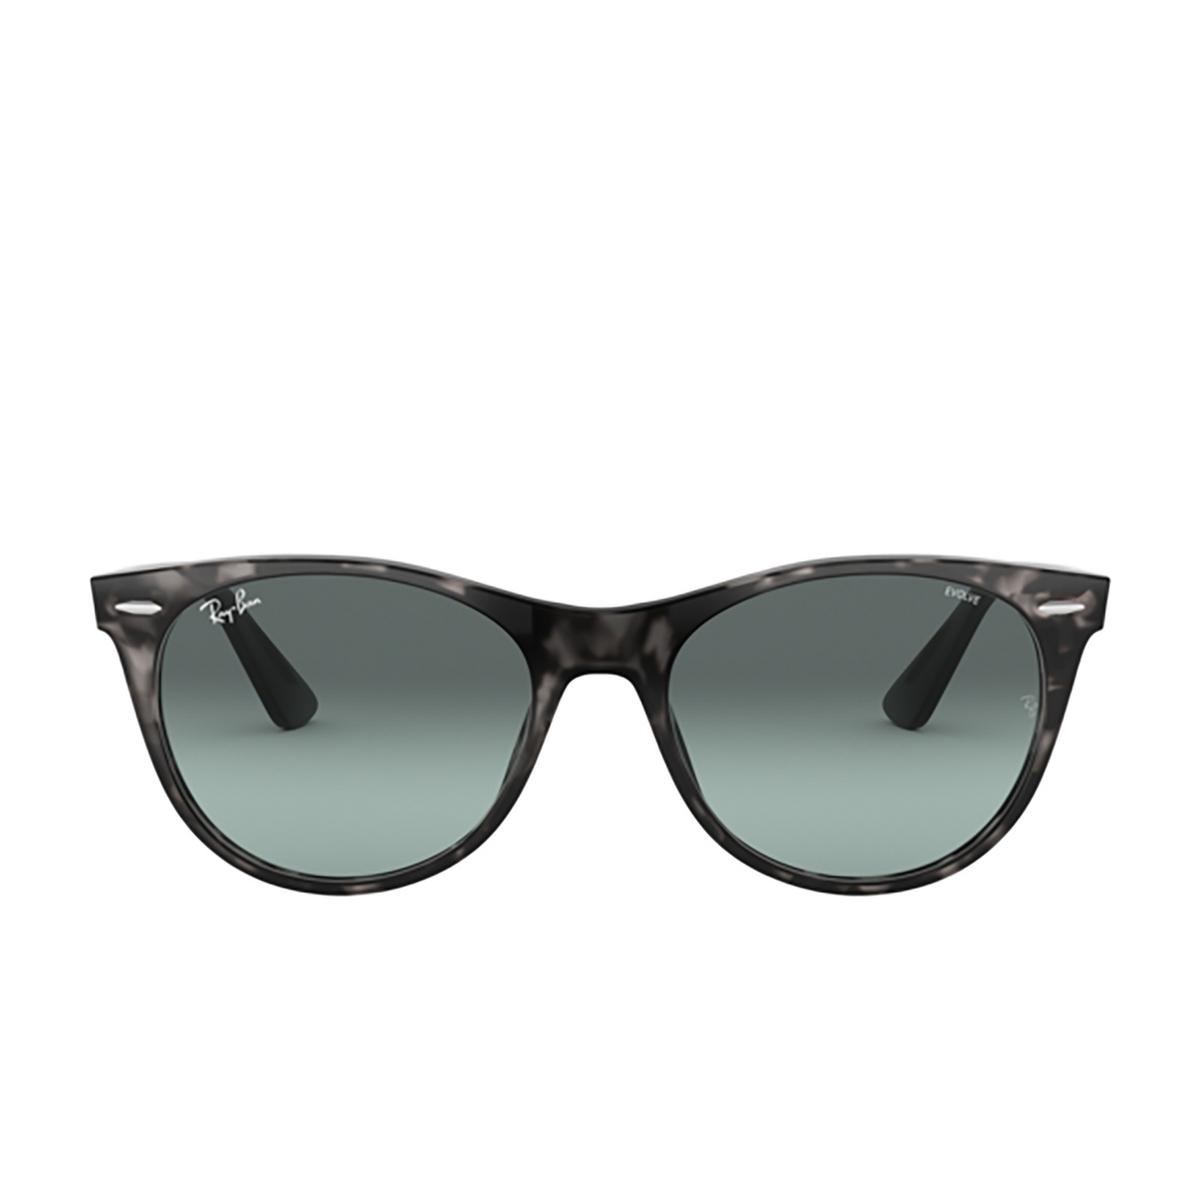 Ray-Ban® Square Sunglasses: Wayfarer Ii RB2185 color Grey Havana 1250AD - front view.